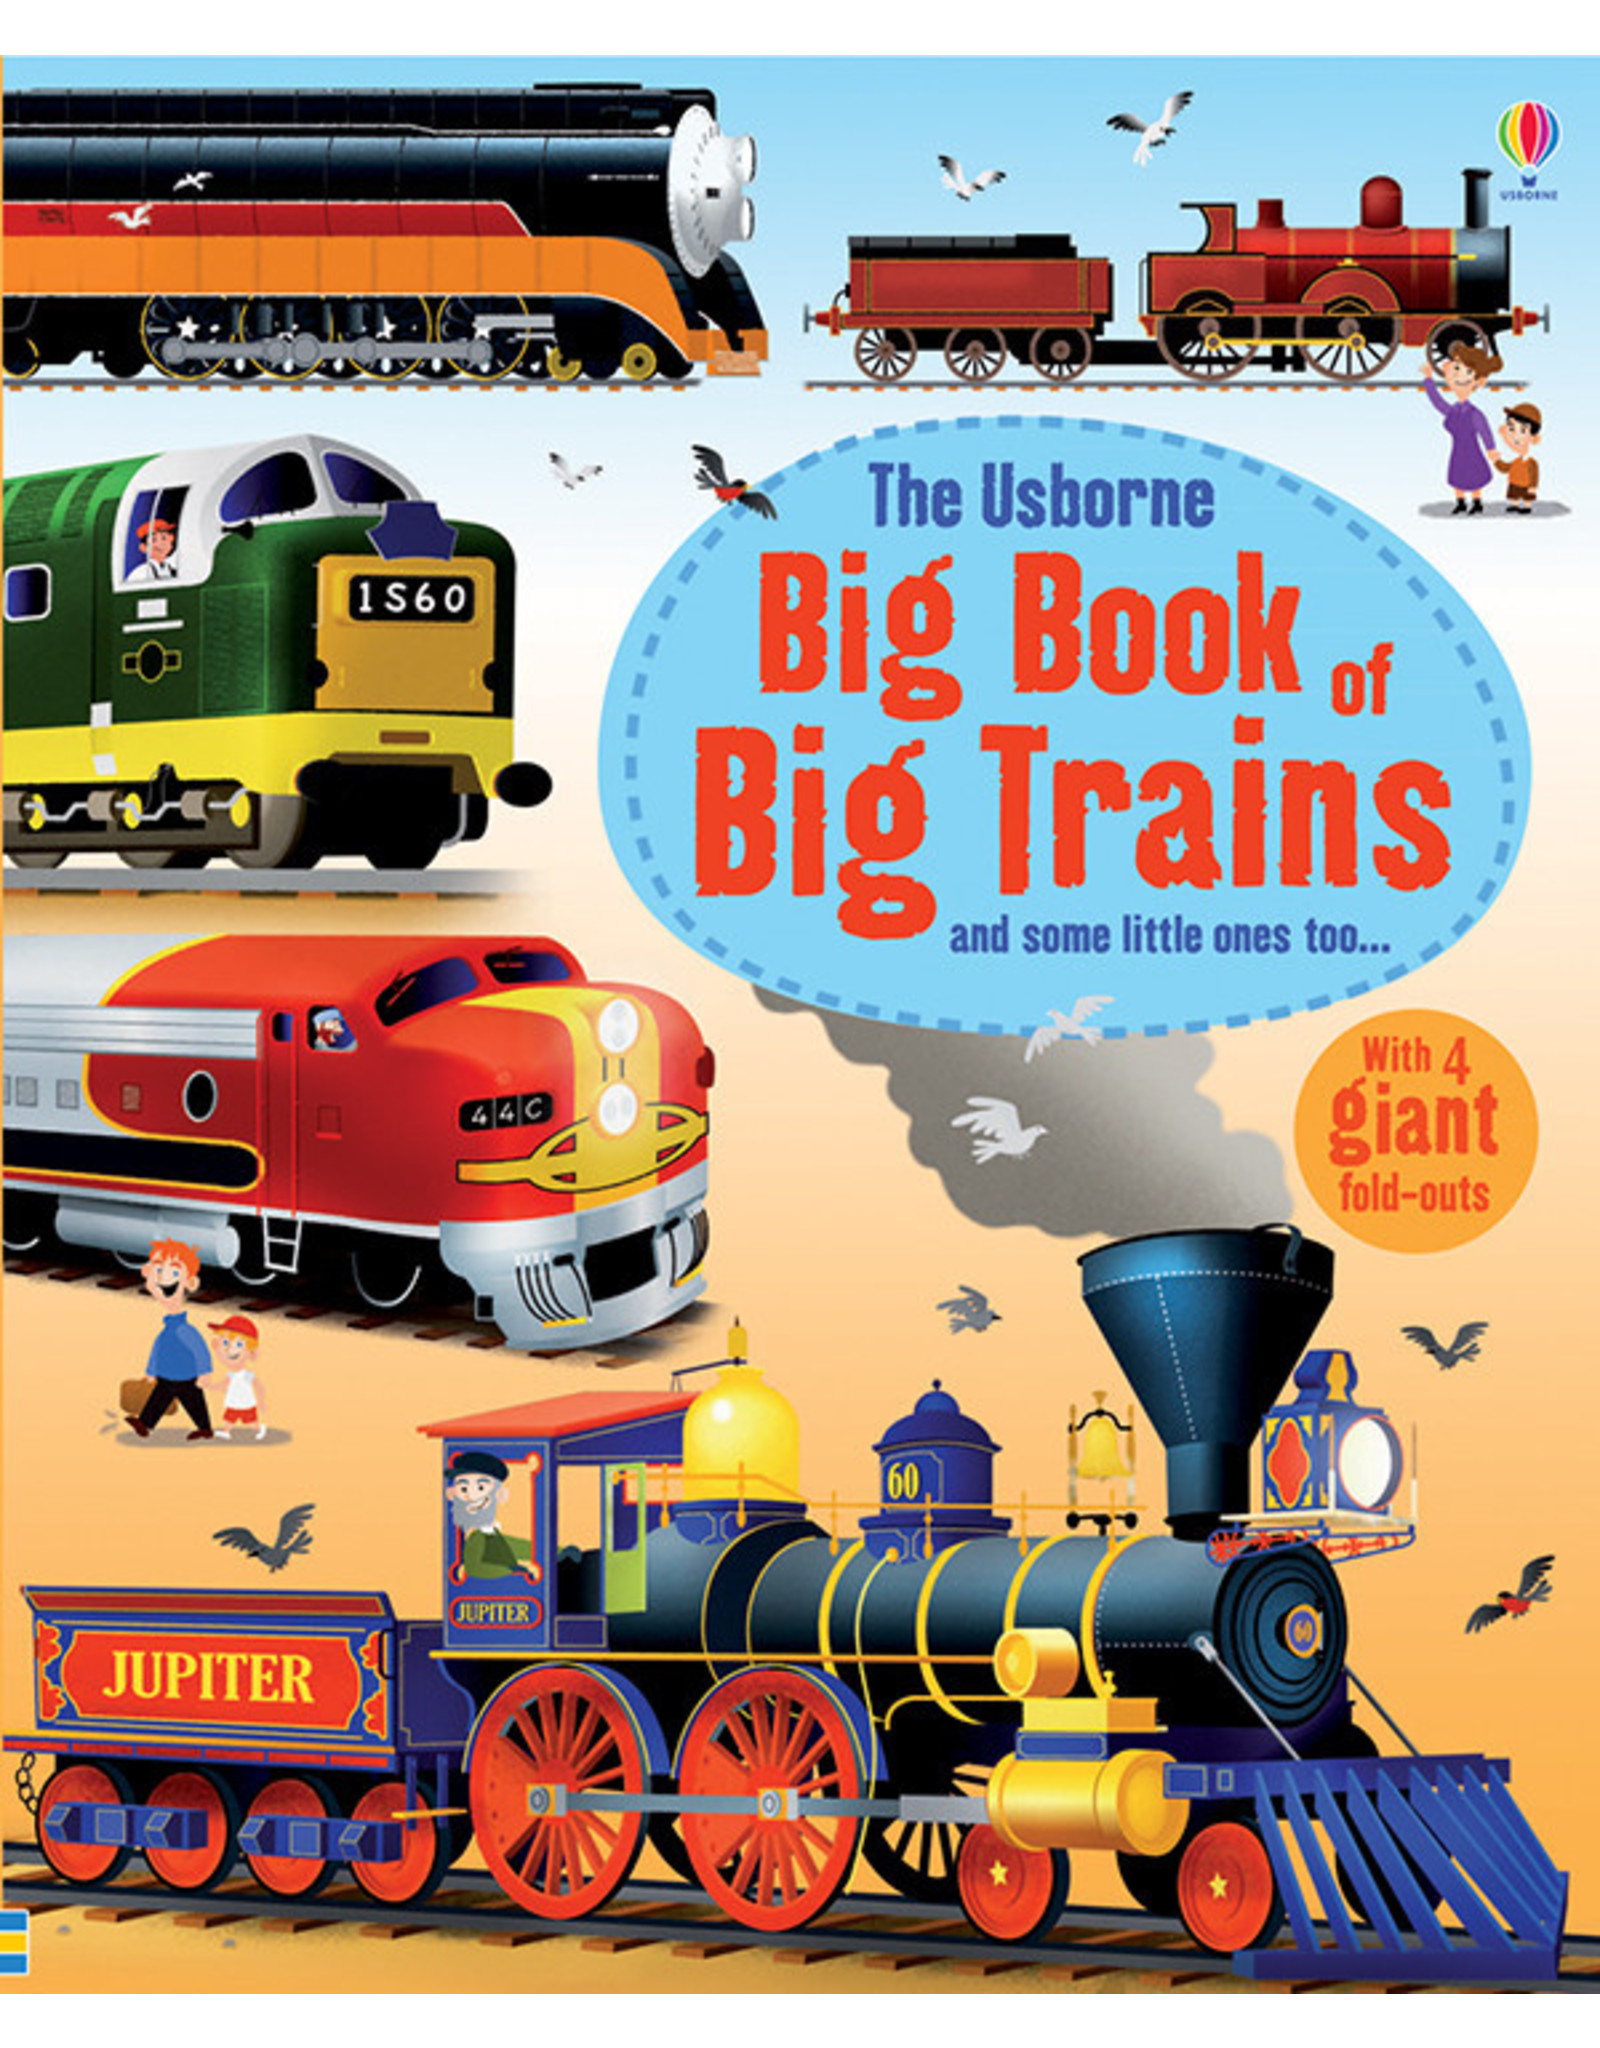 Usborne & Kane Miller Books Big Book of Big Trains